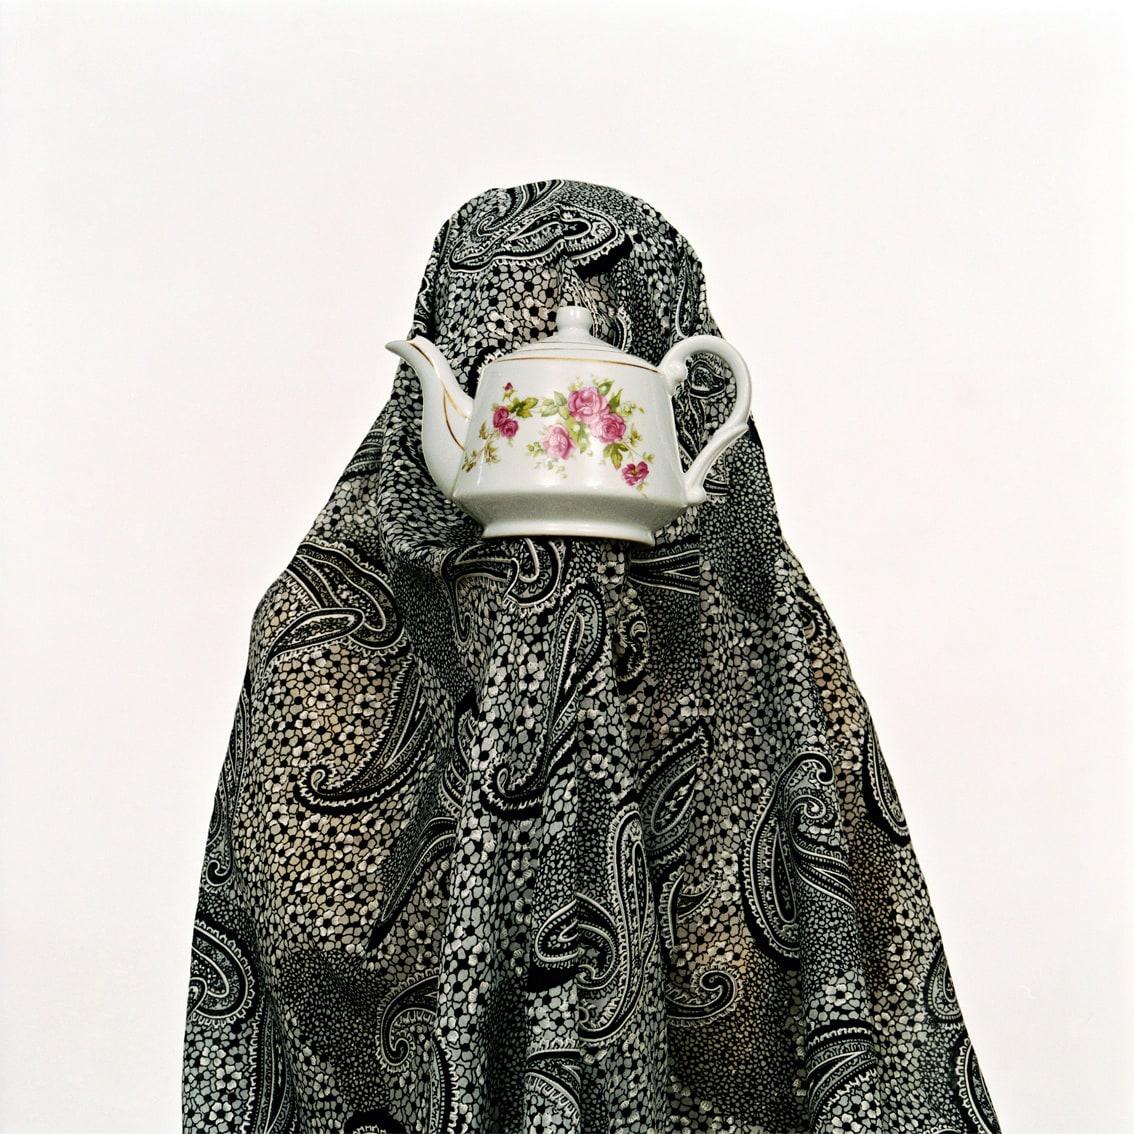 Shadi GHADIRIAN, Like everyday (domestic Life) #08 (tea-pot), 2000